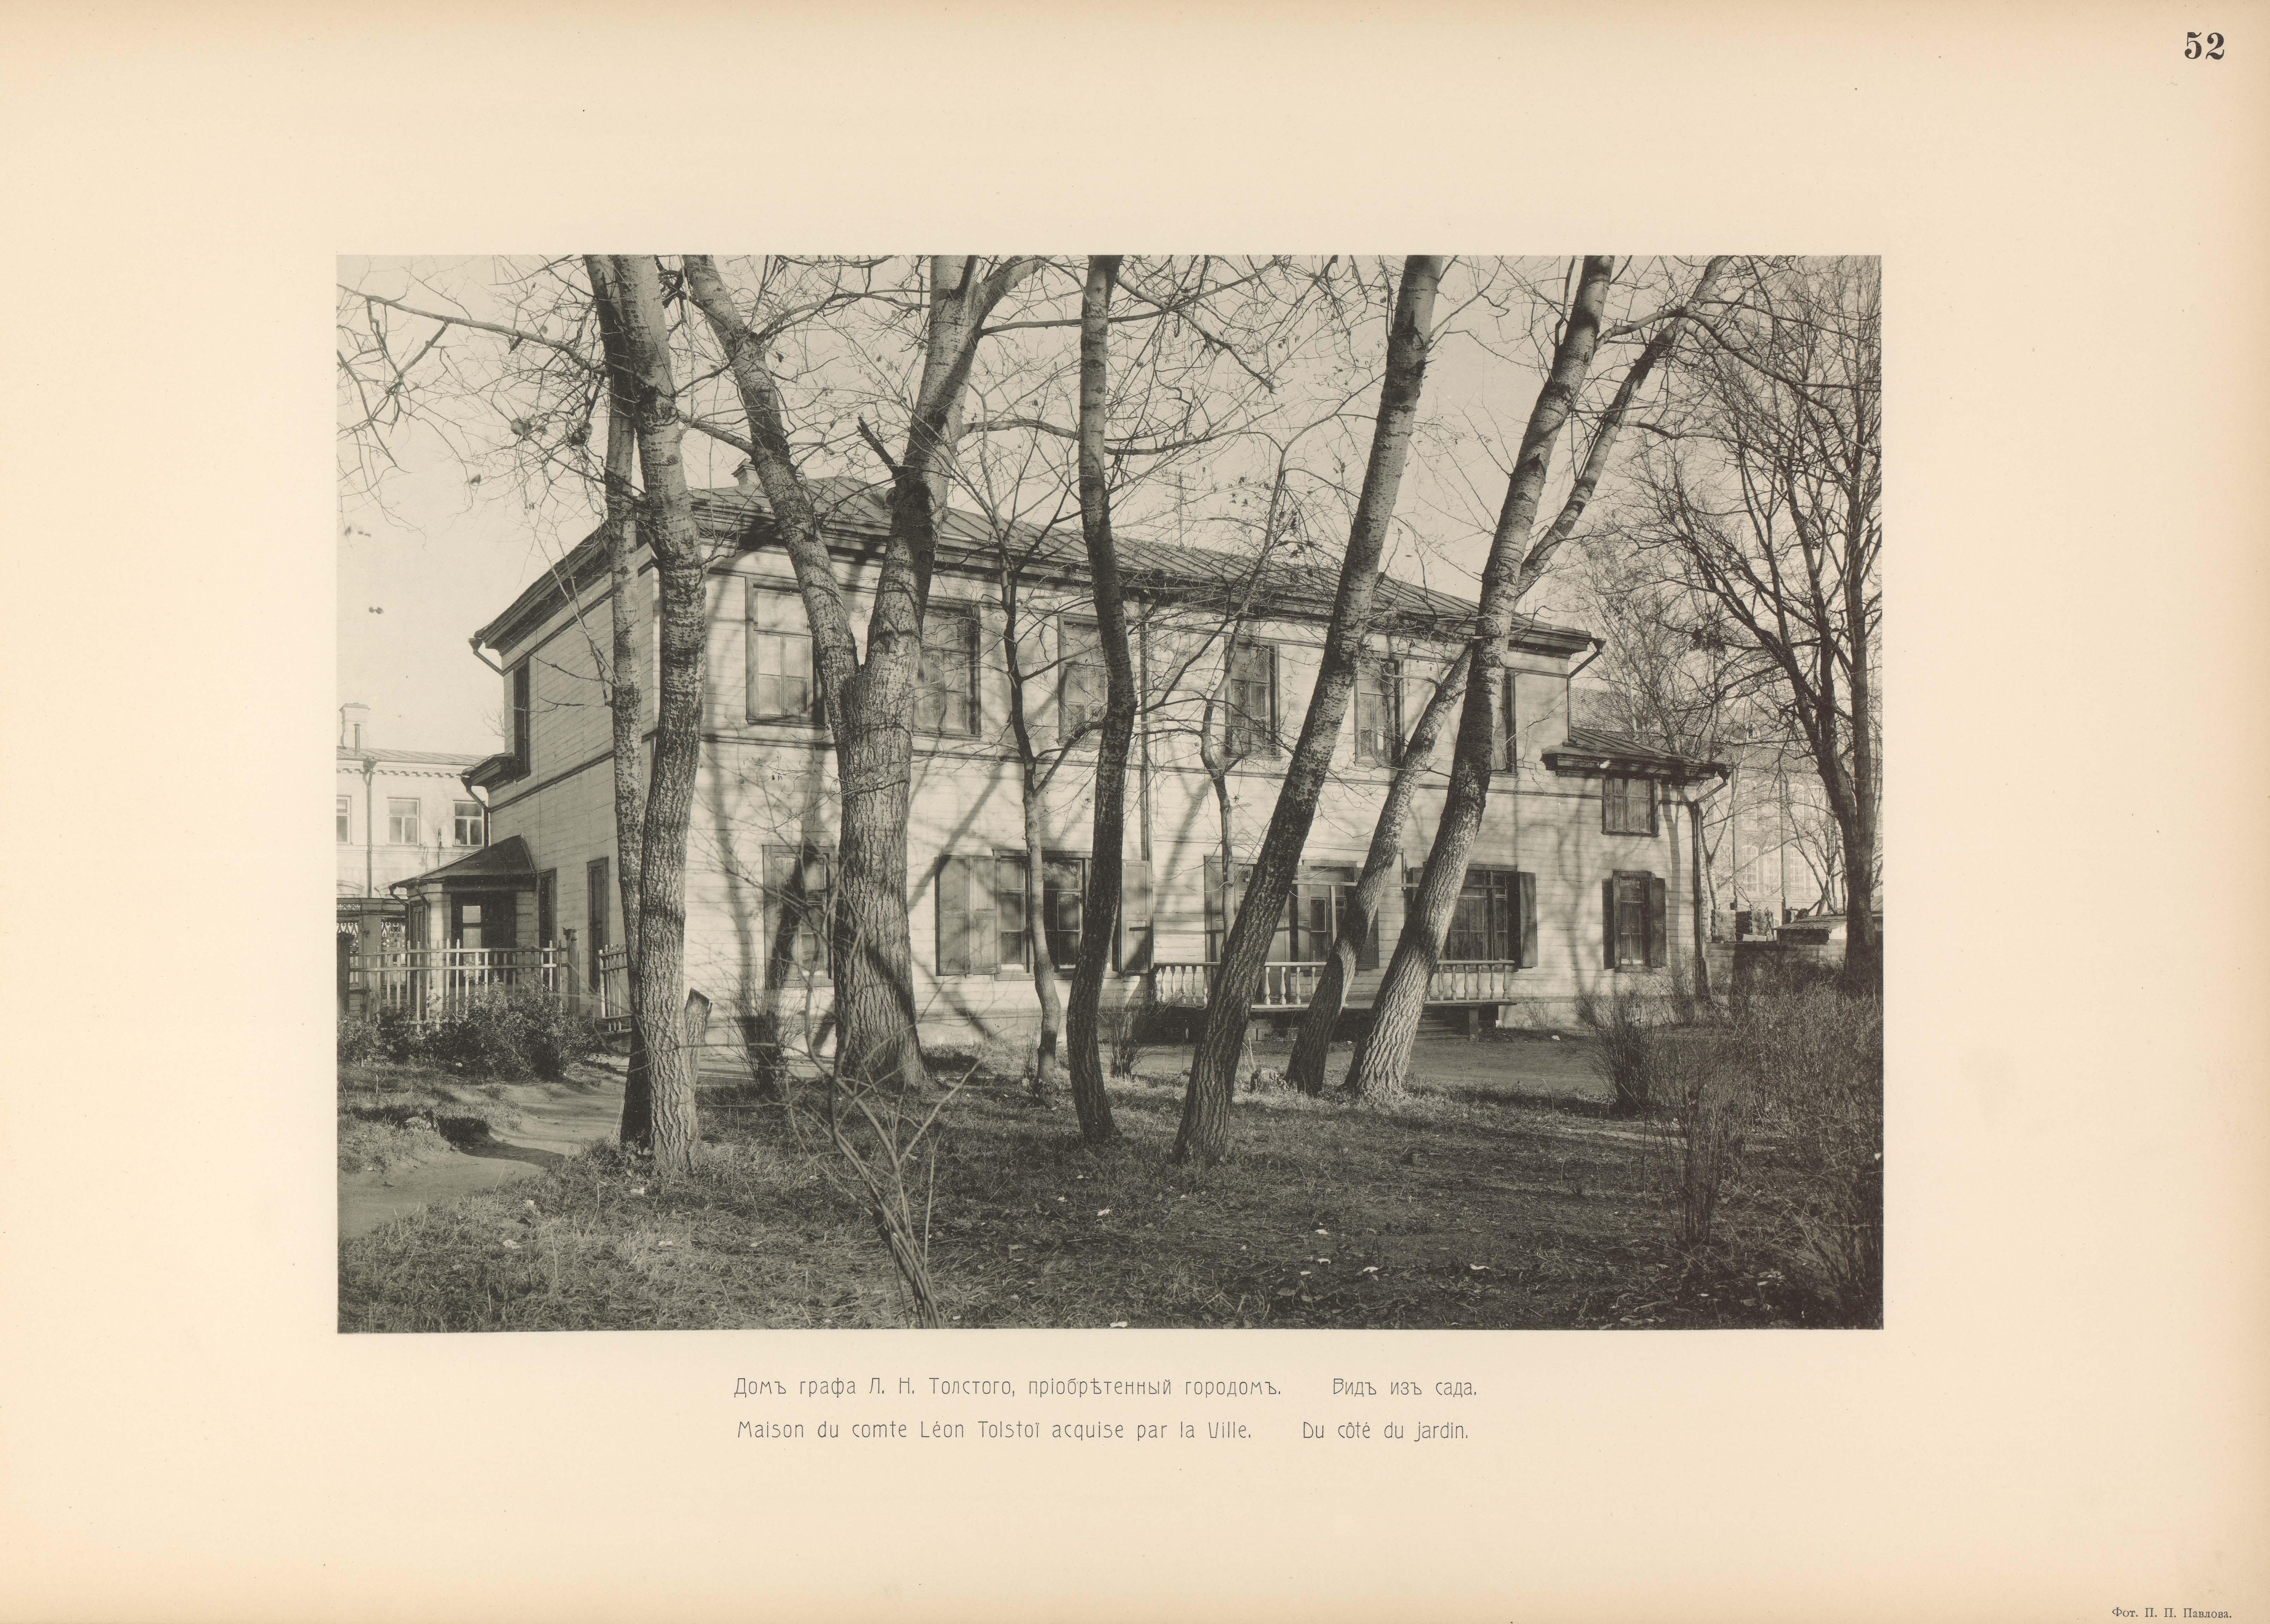 Домъ графа Л. Н. Толстого, прiобрѣтенный городомъ. Видъ изъ сада.